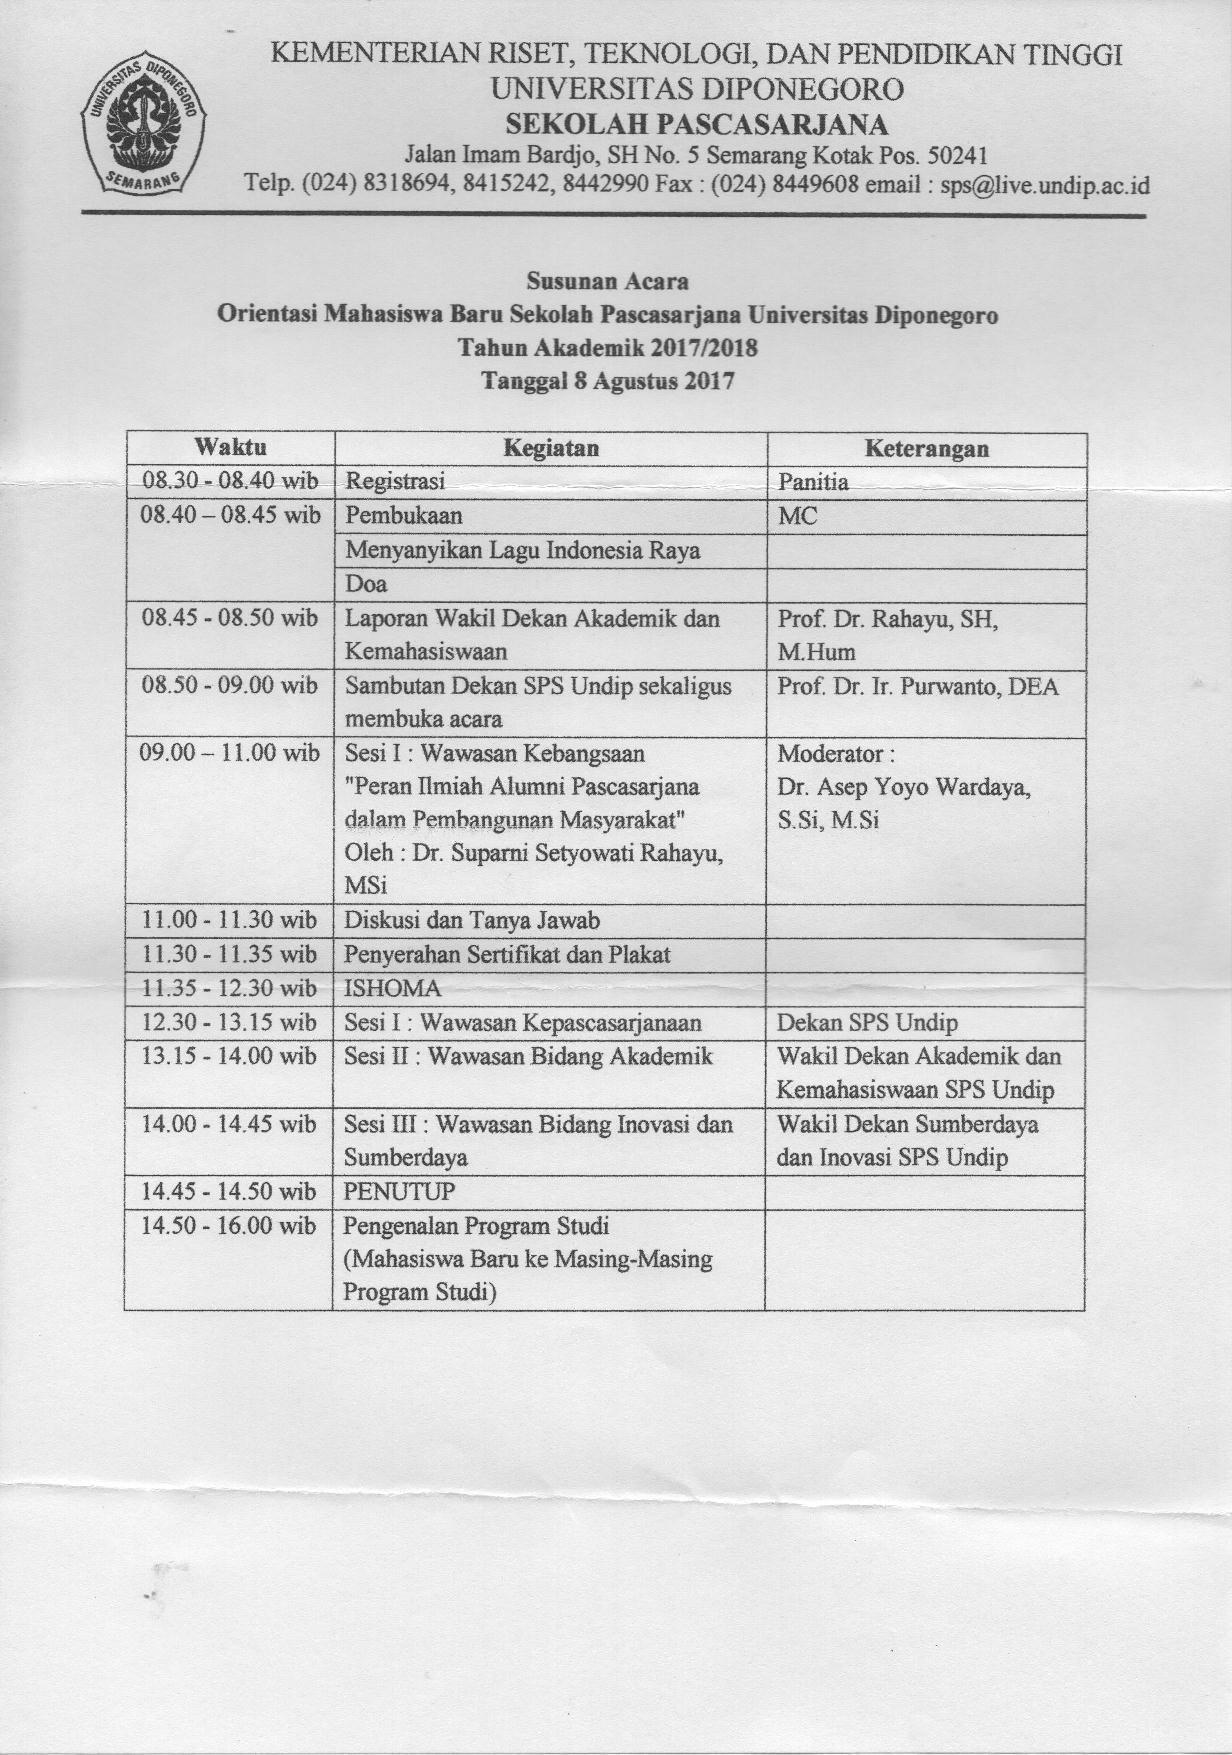 Orientasi Mahasiswa Baru Sekolah Pascasarjana UNDIP 2017/2018